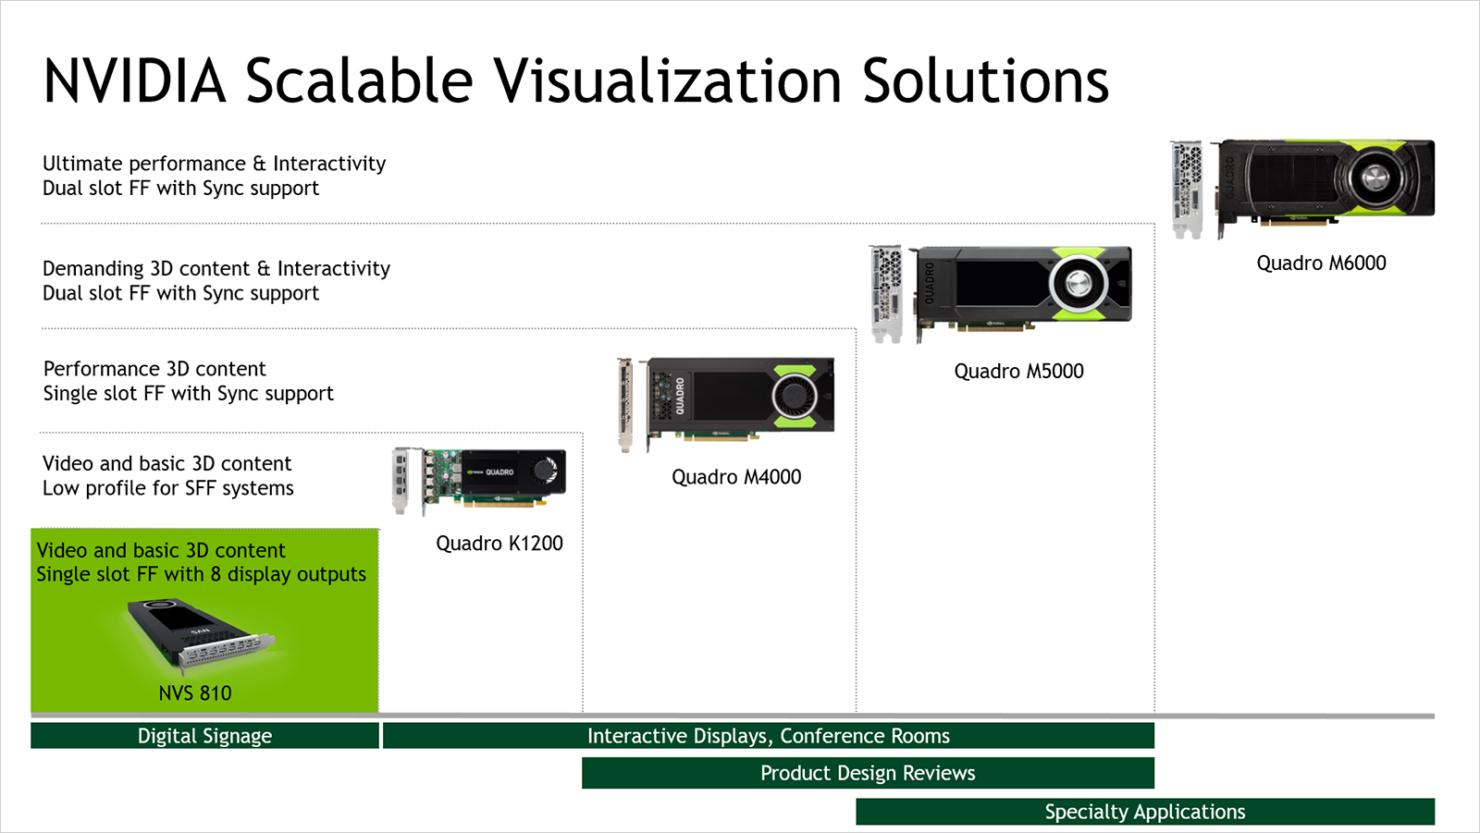 nvidia-nvs-810-visualization-solution